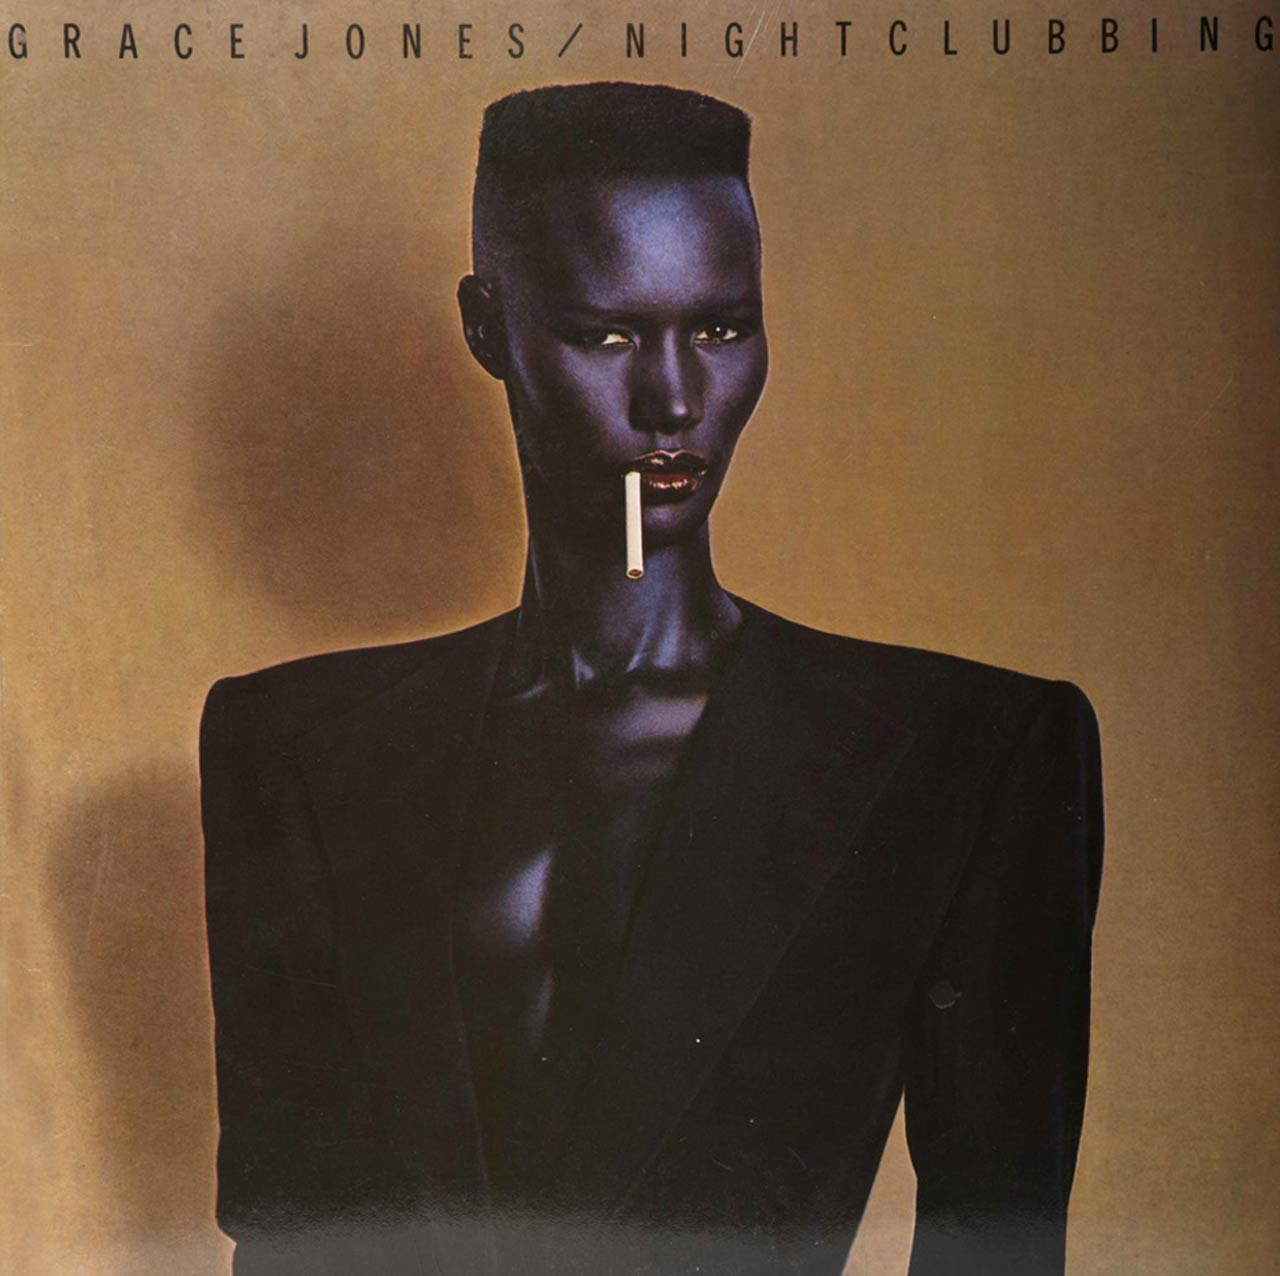 The graphic art of Greg Porto - Grace Jones - Nightclubbing